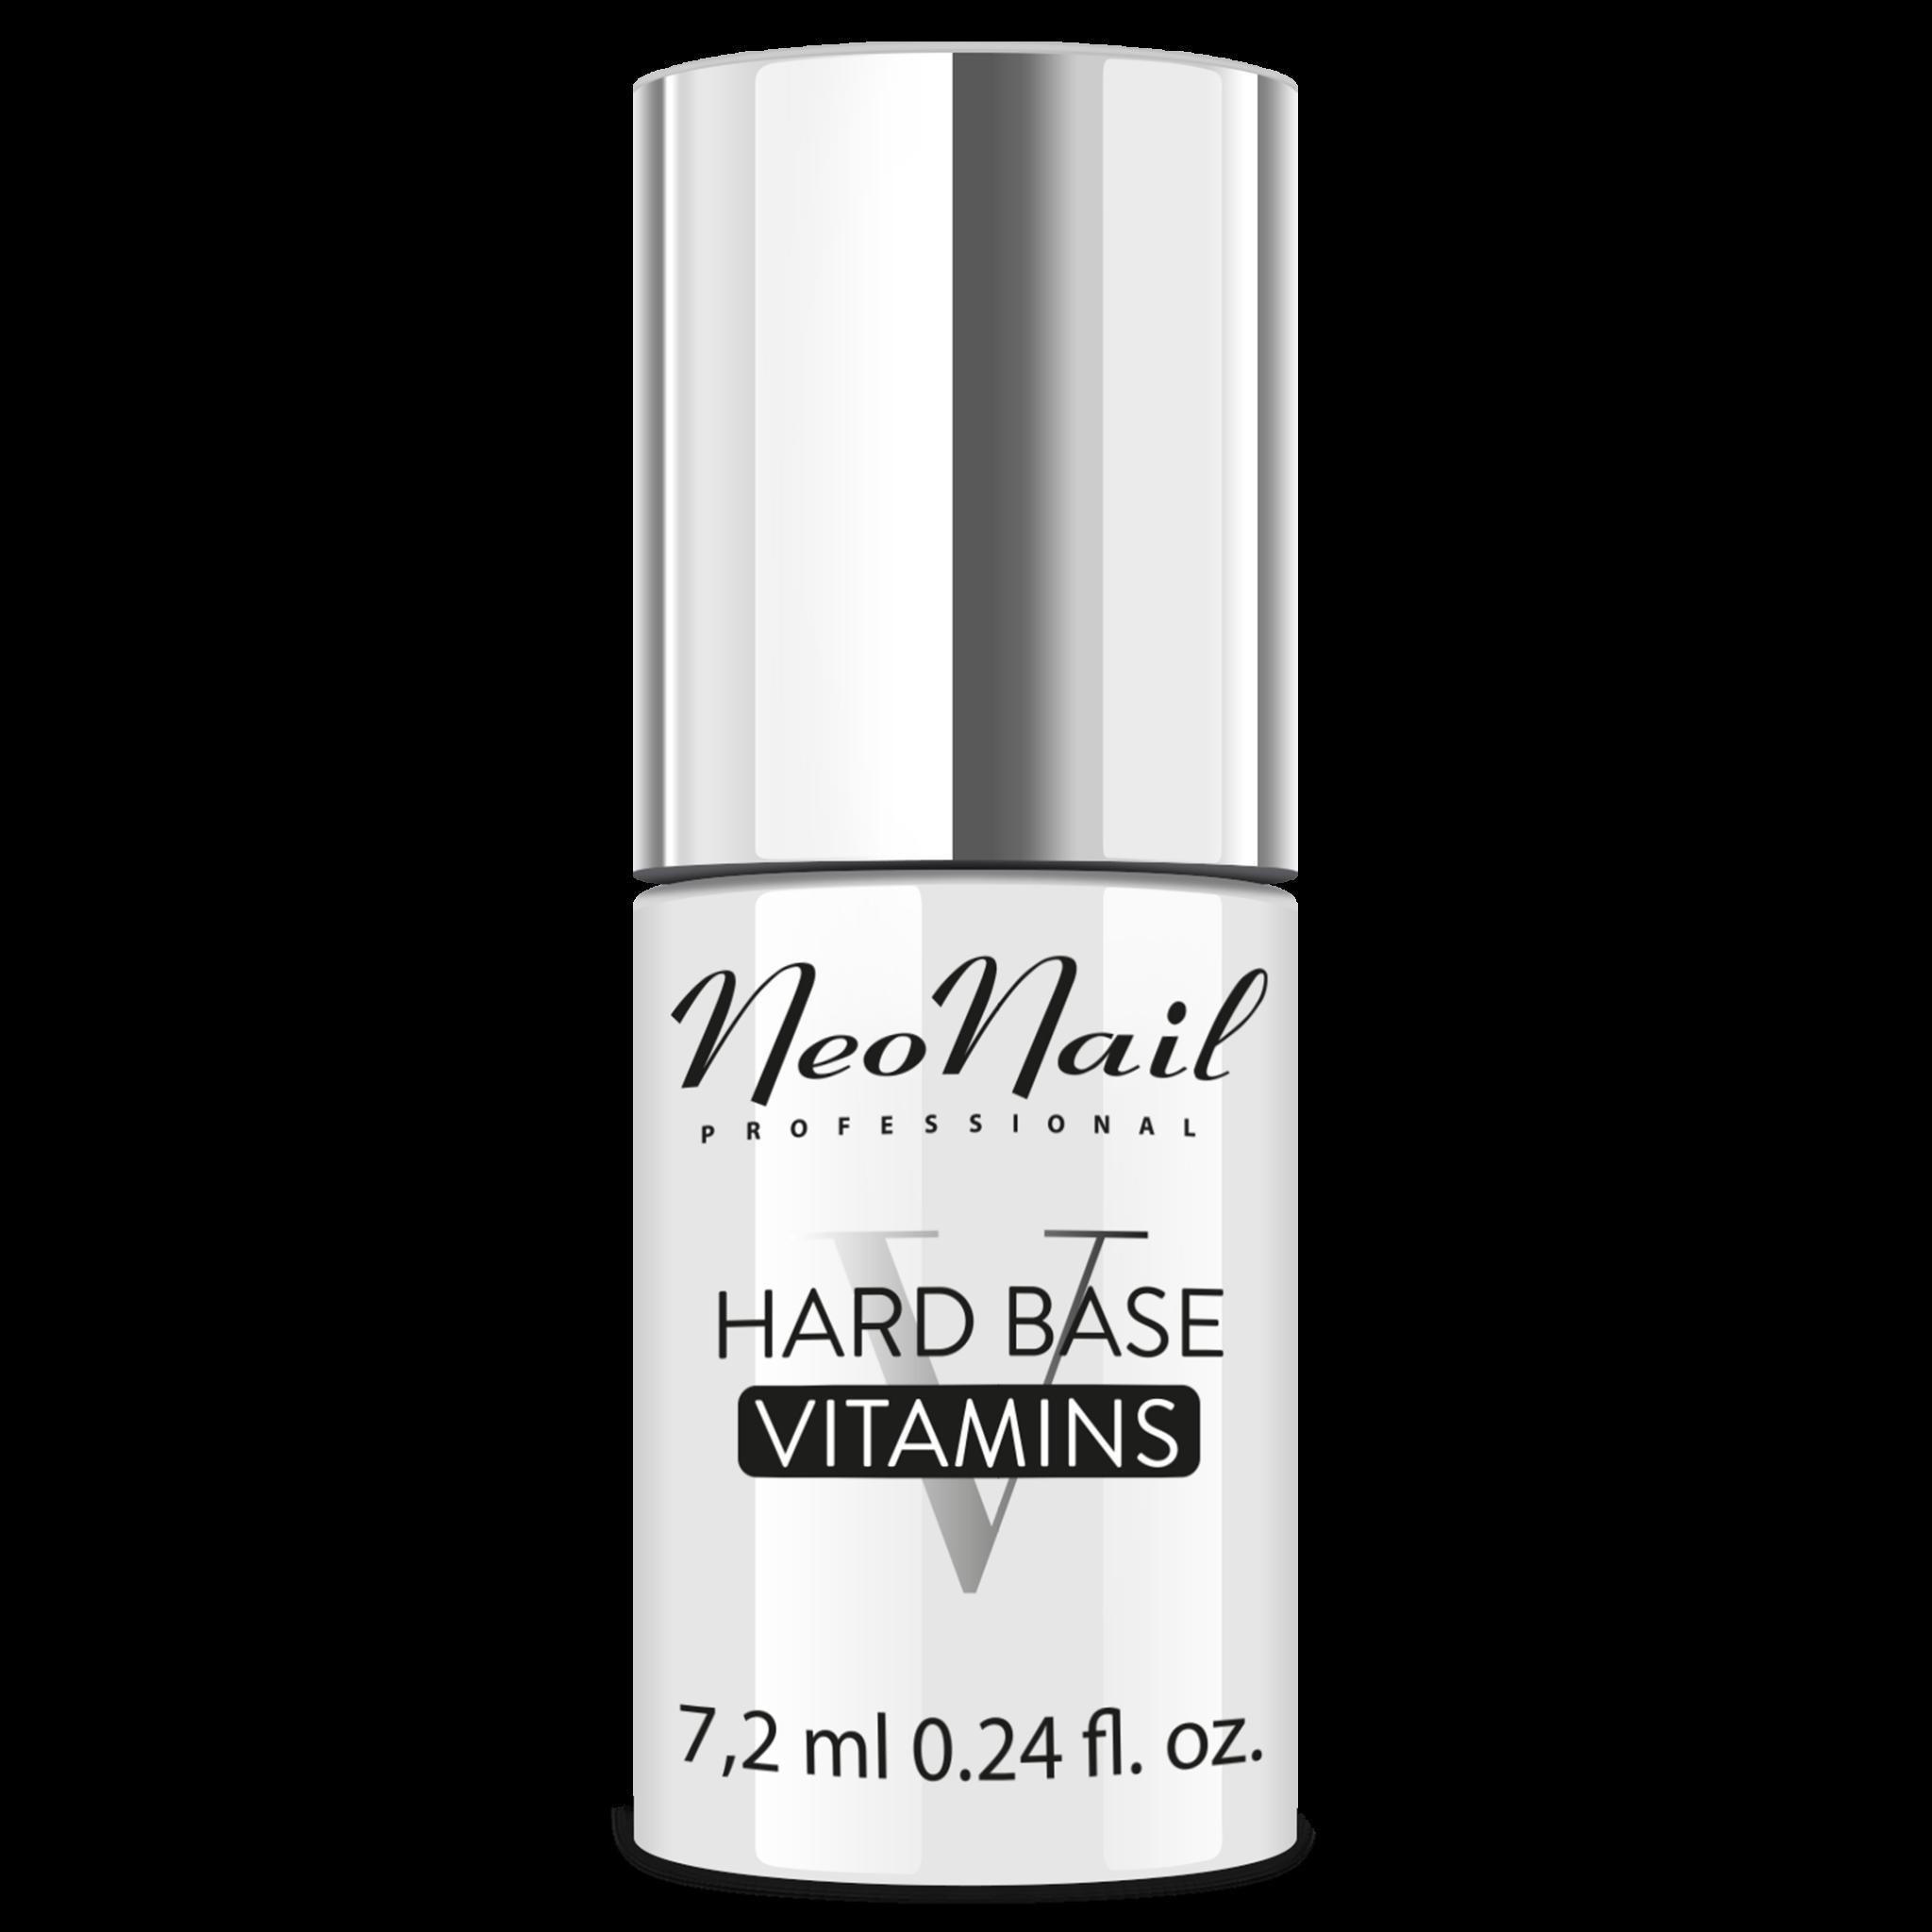 Gelio lako bazė 7,2 ml – Hard Base Vitamins